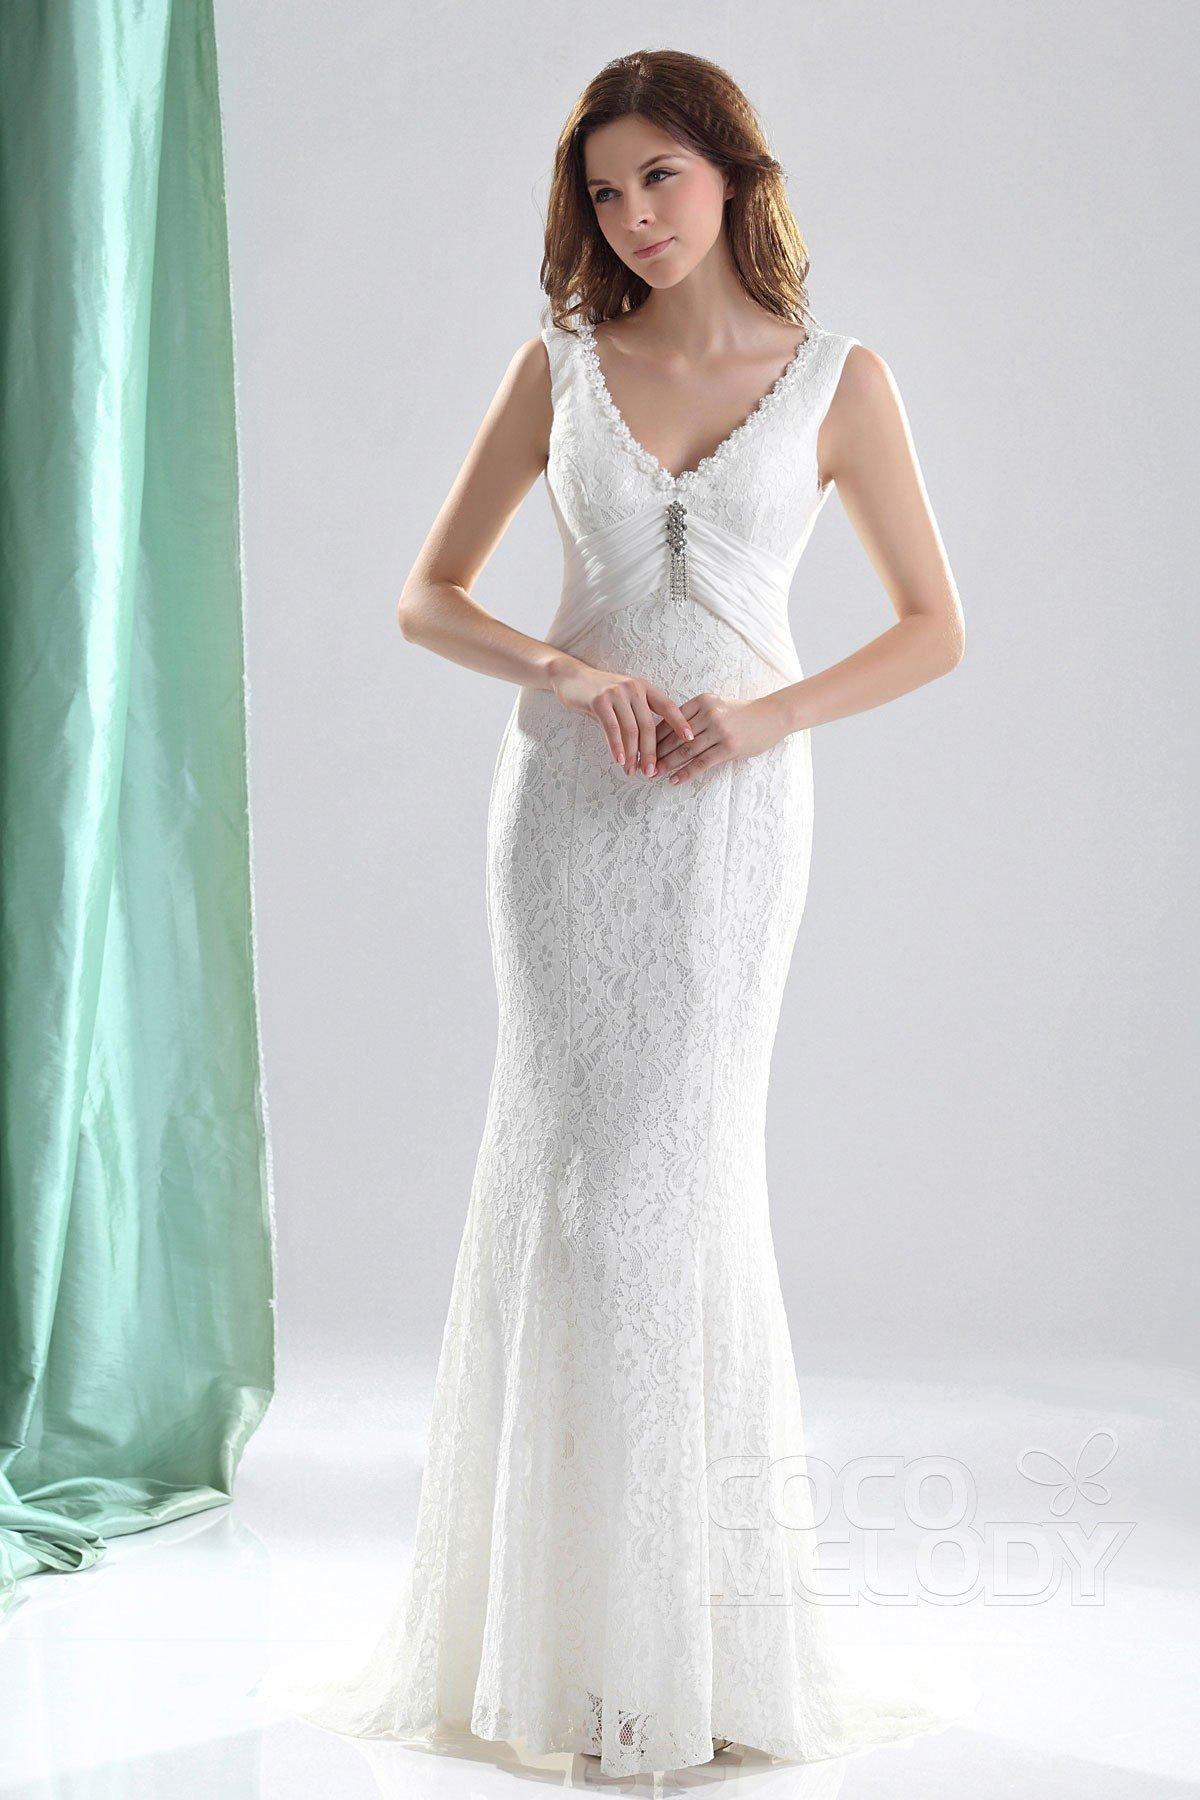 Sheath-Column Train Lace Wedding Dress CWLT13052 | Cocomelody